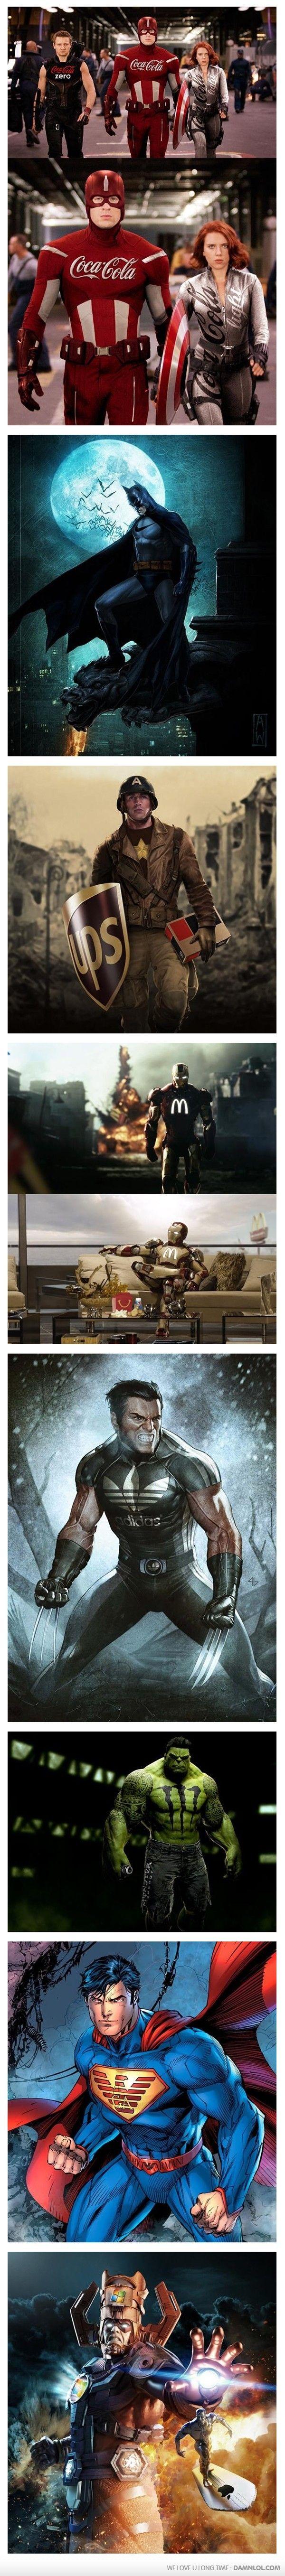 If Superheroes Had Sponsor - The Avengers, Batman, Superman, and Wolverine.